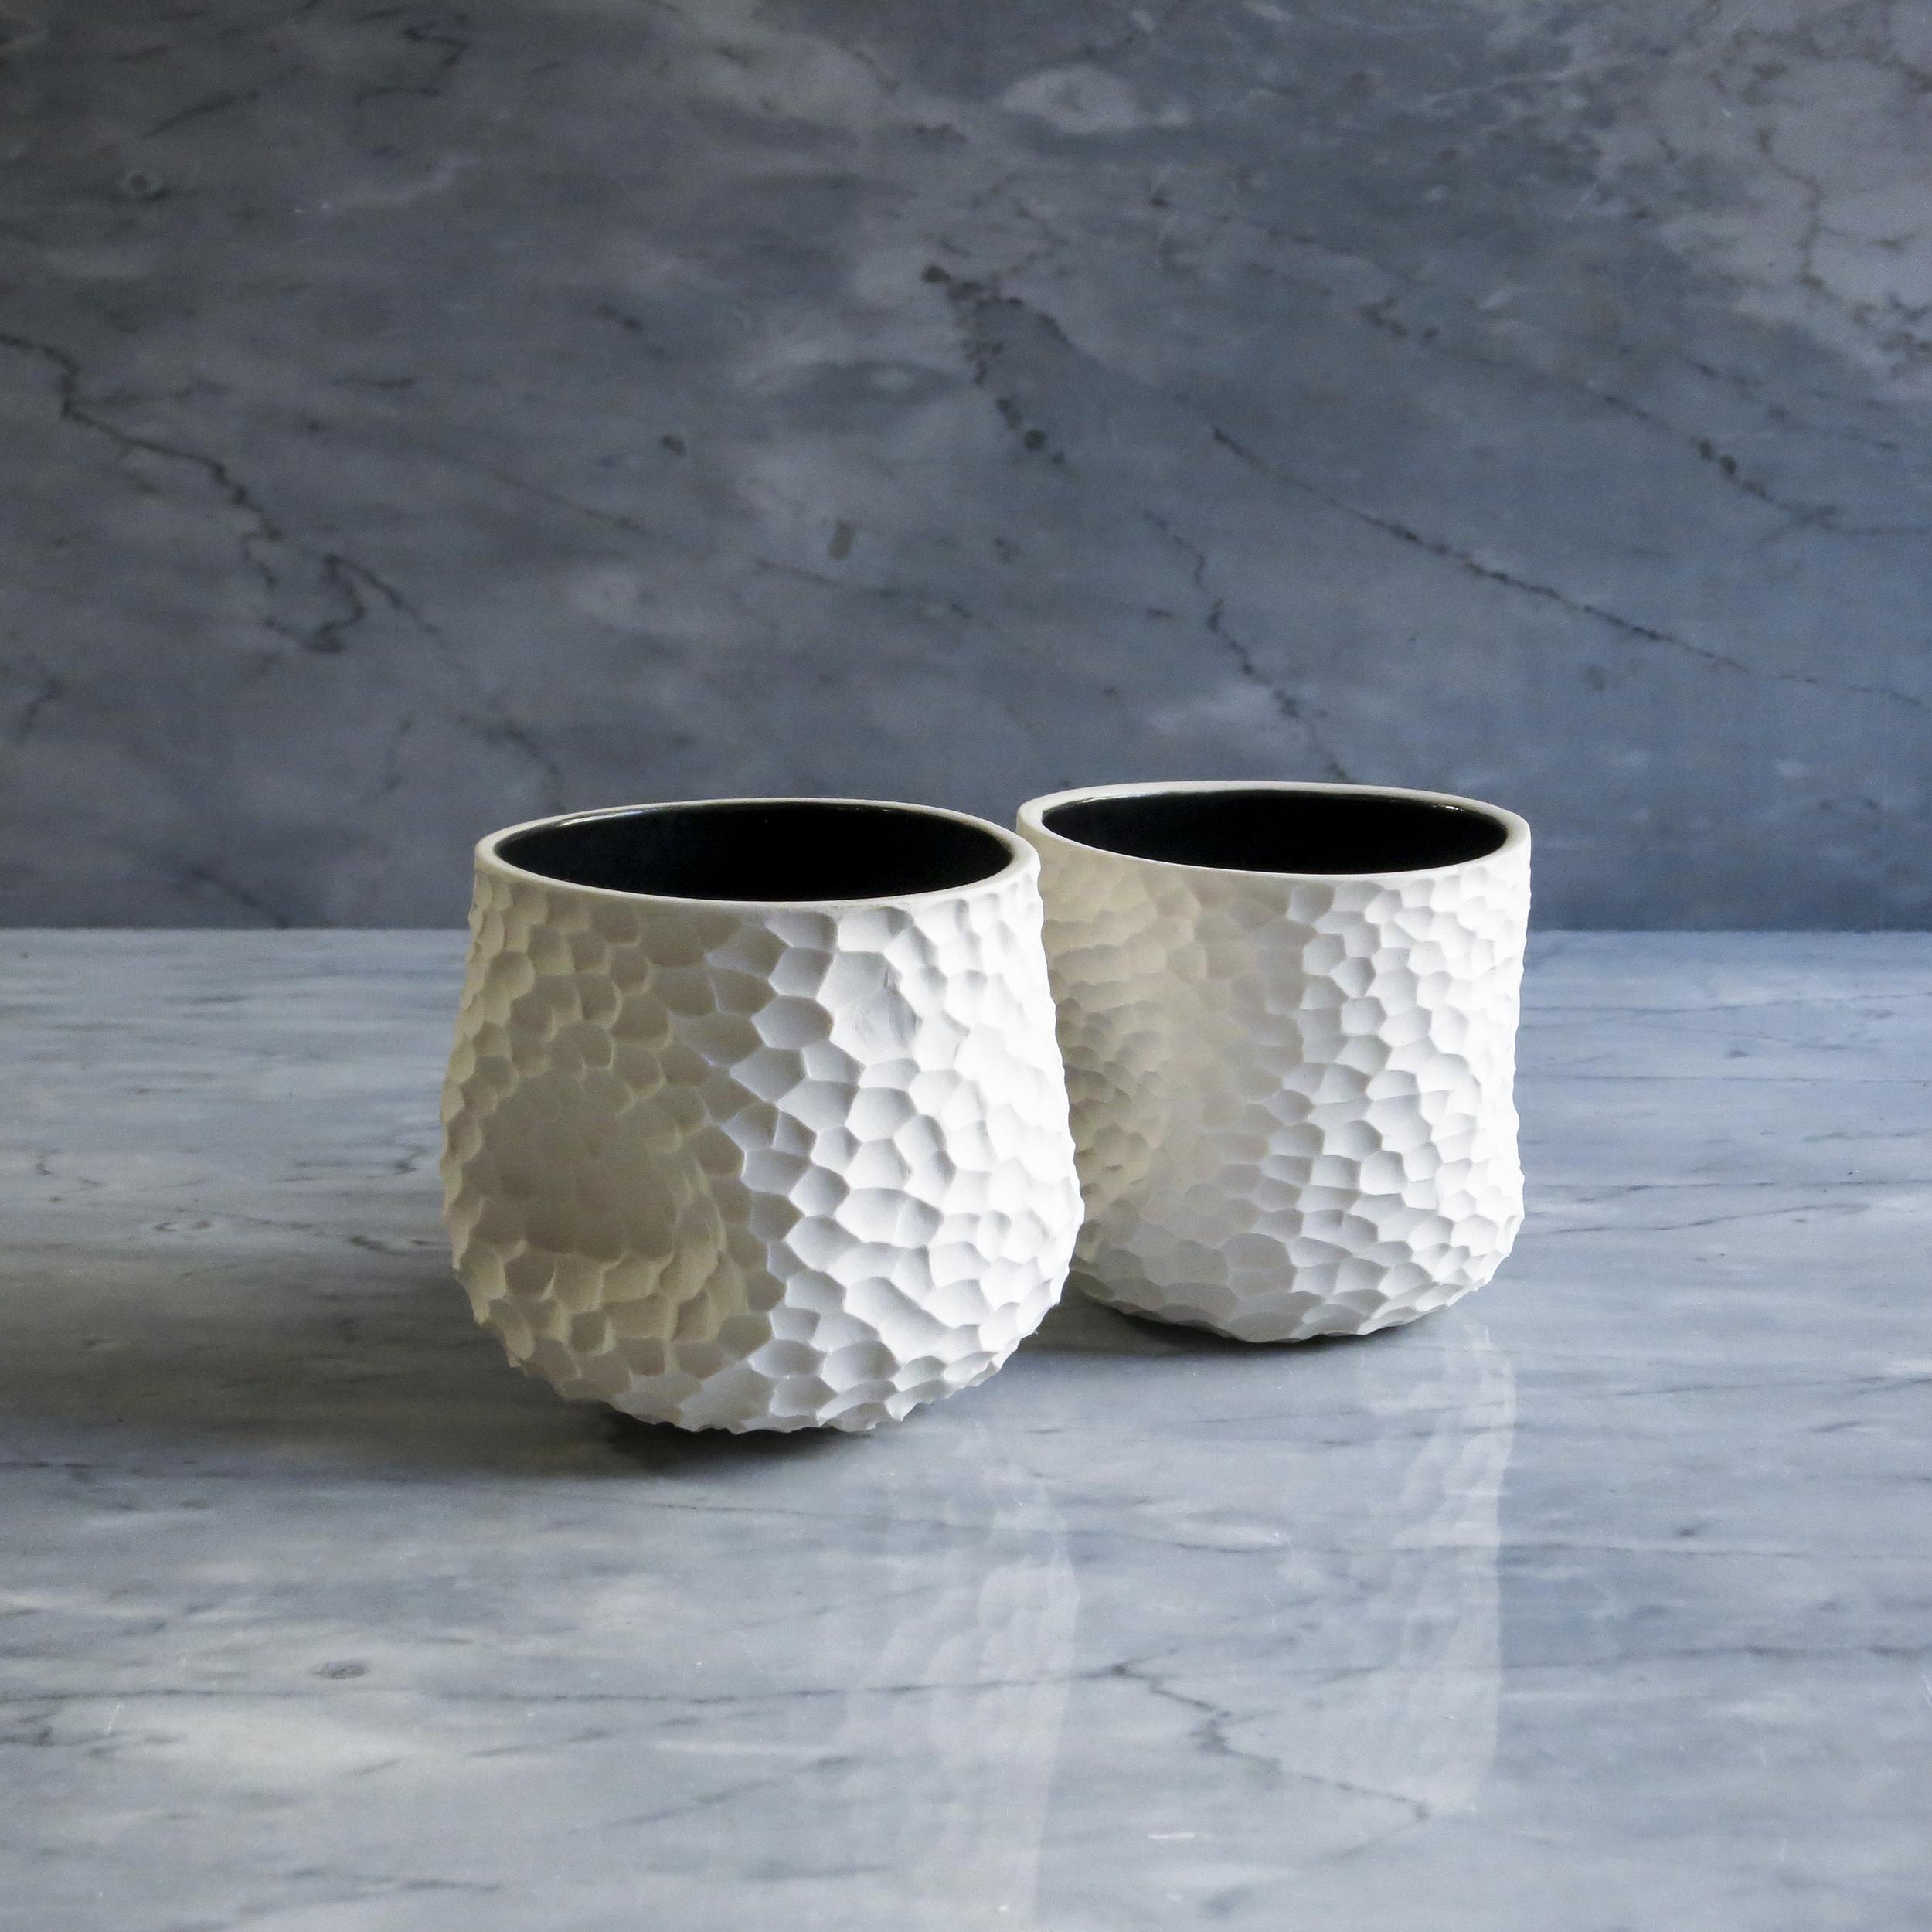 BAC_Tea Bowls_White-Black_1.jpg